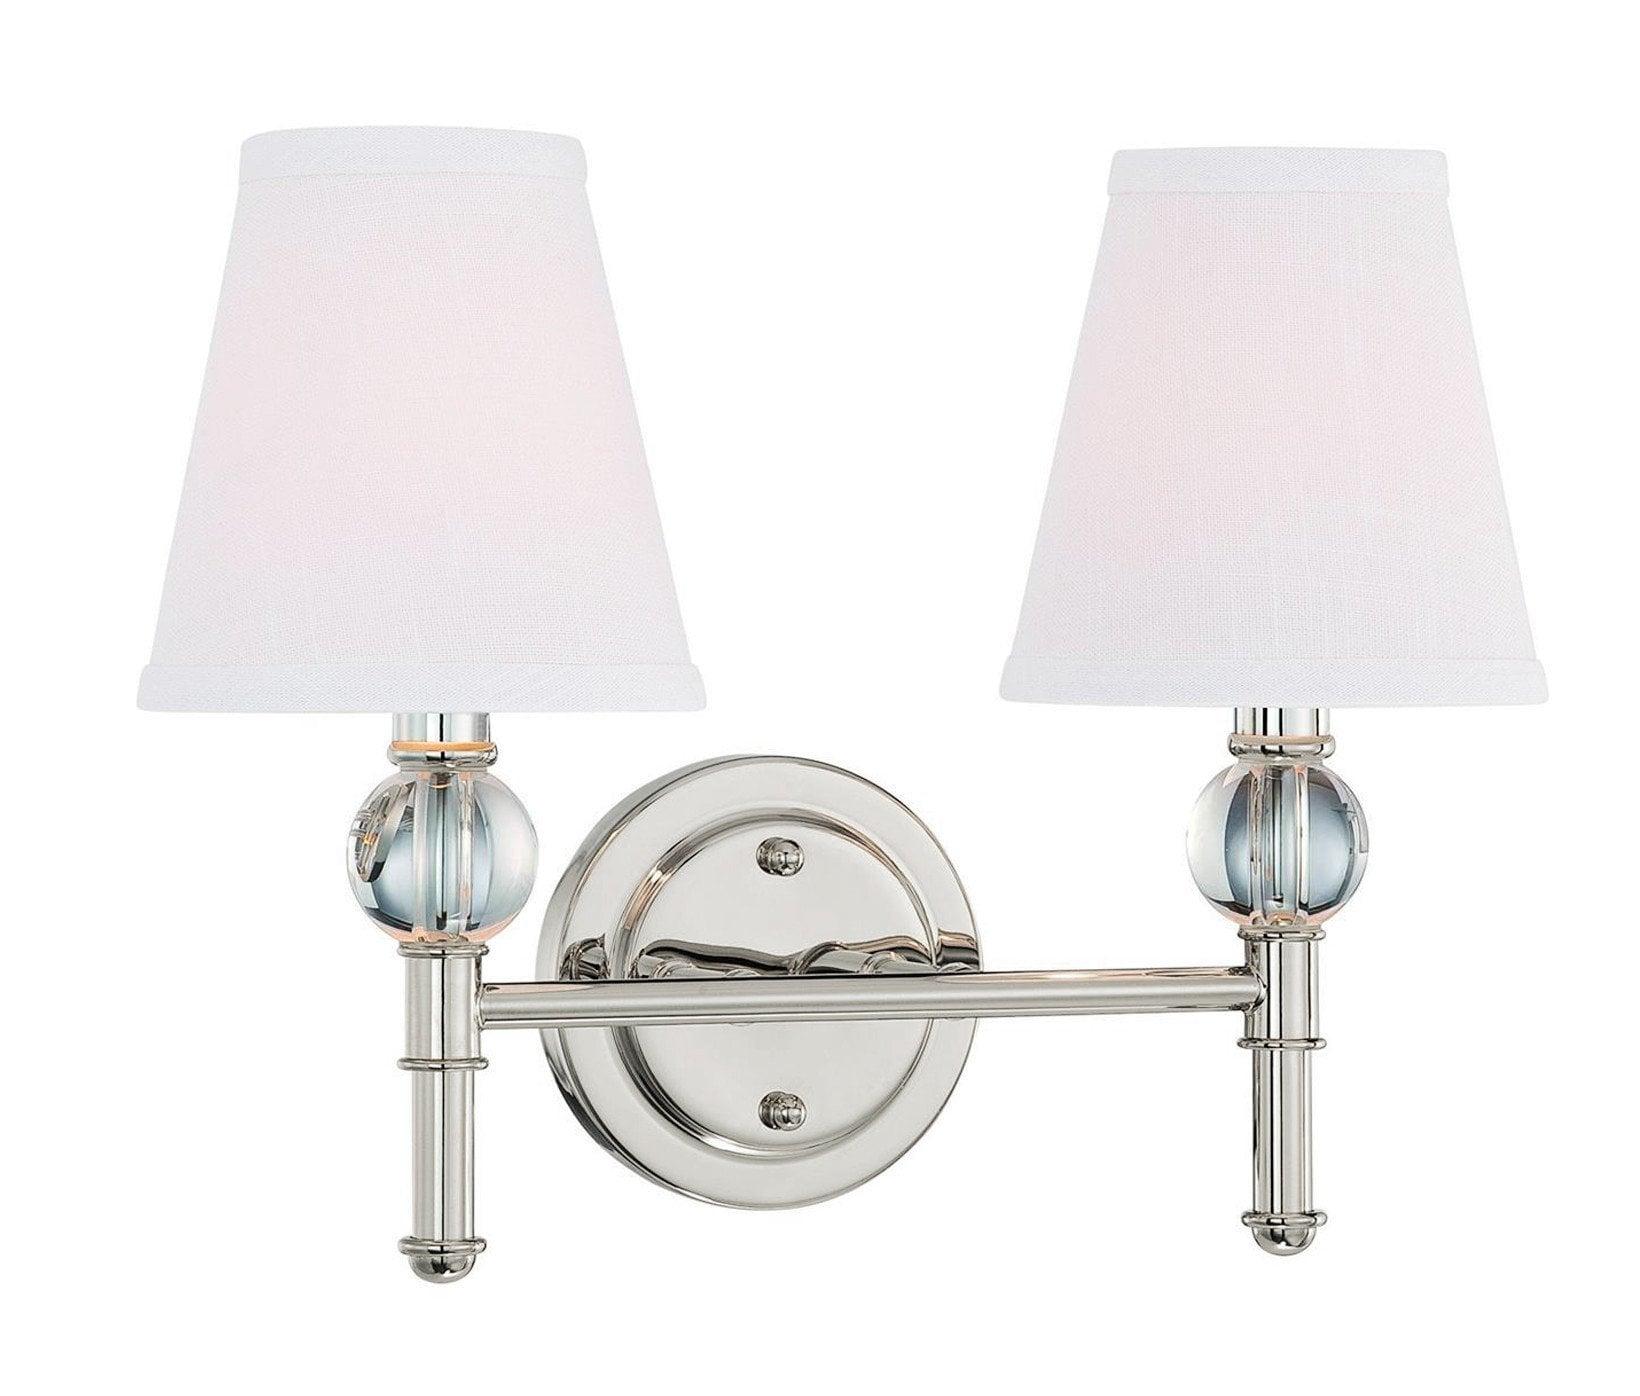 Two (2) Langdon Mills Savoy Polished Nickel Bathroom Vanity Light Fixture 0